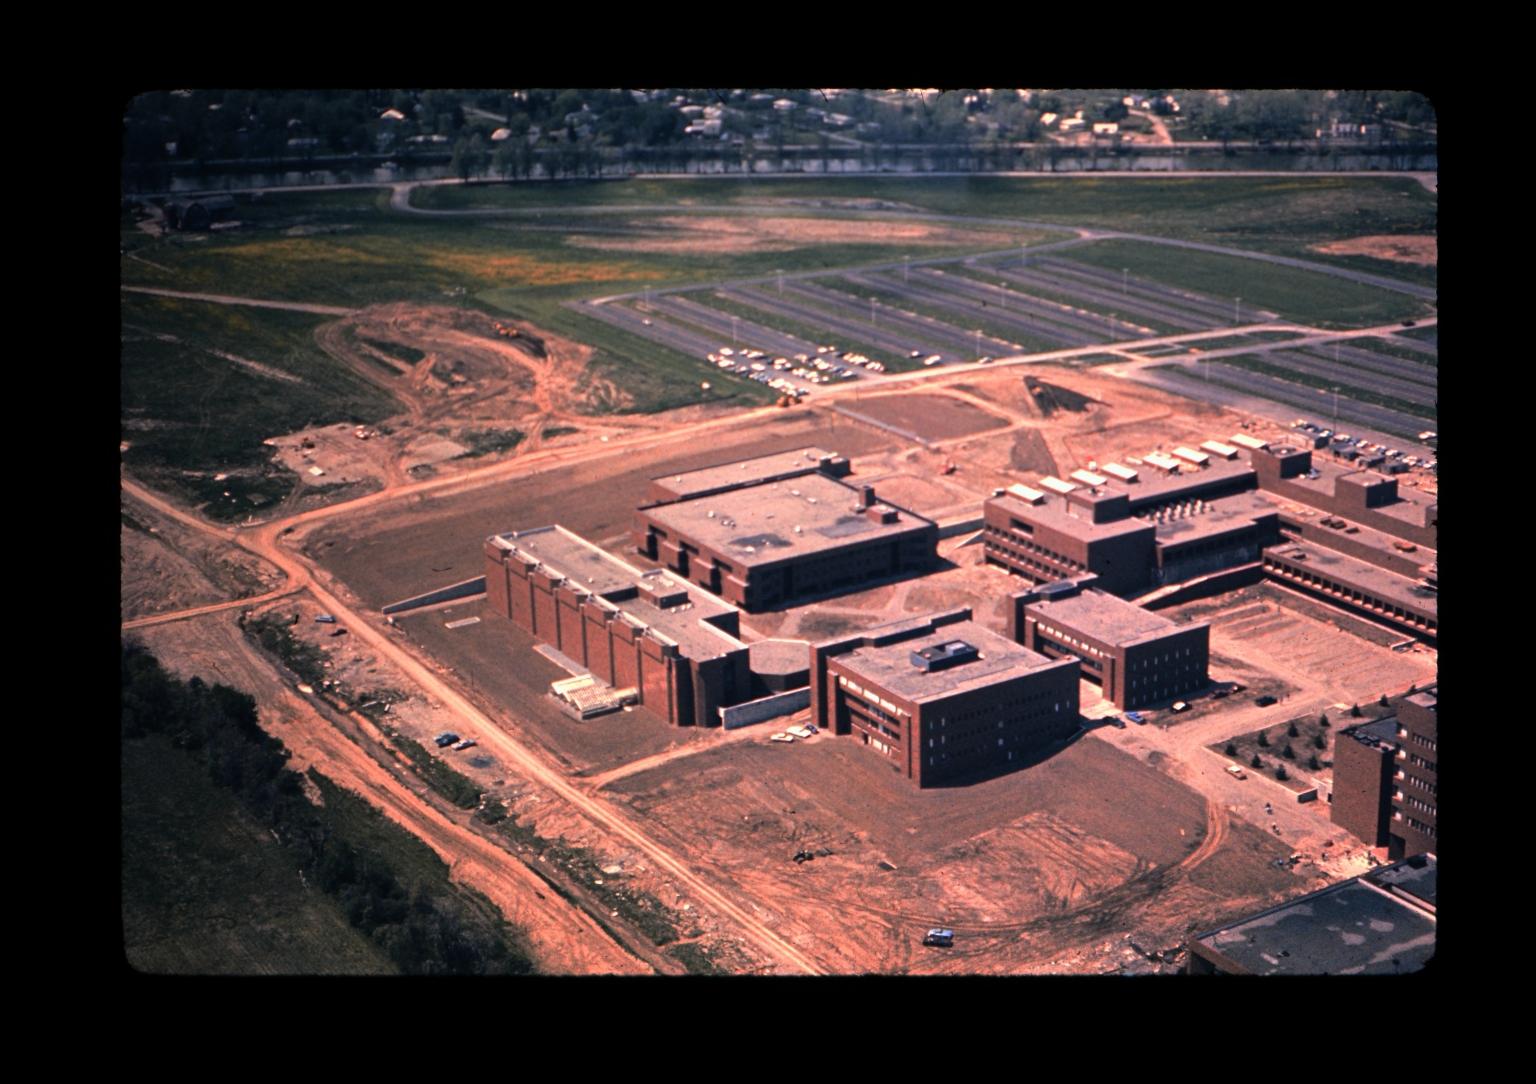 Aerial photograph of RIT campus